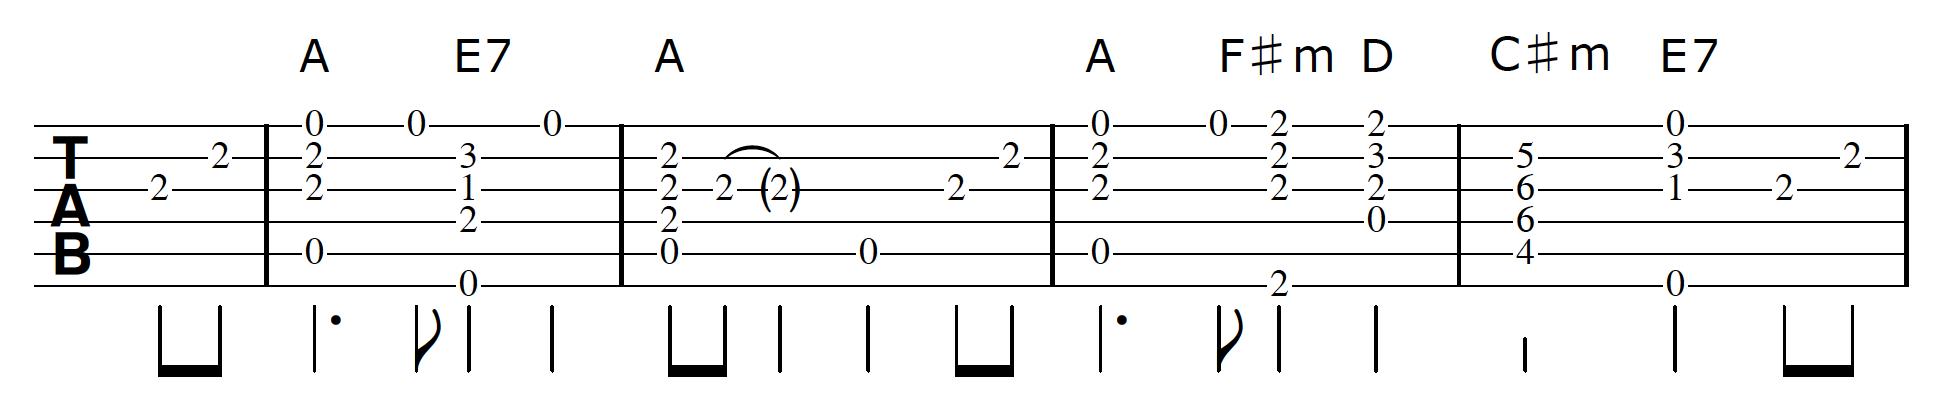 Parallel Key Modulation Arrangement 1